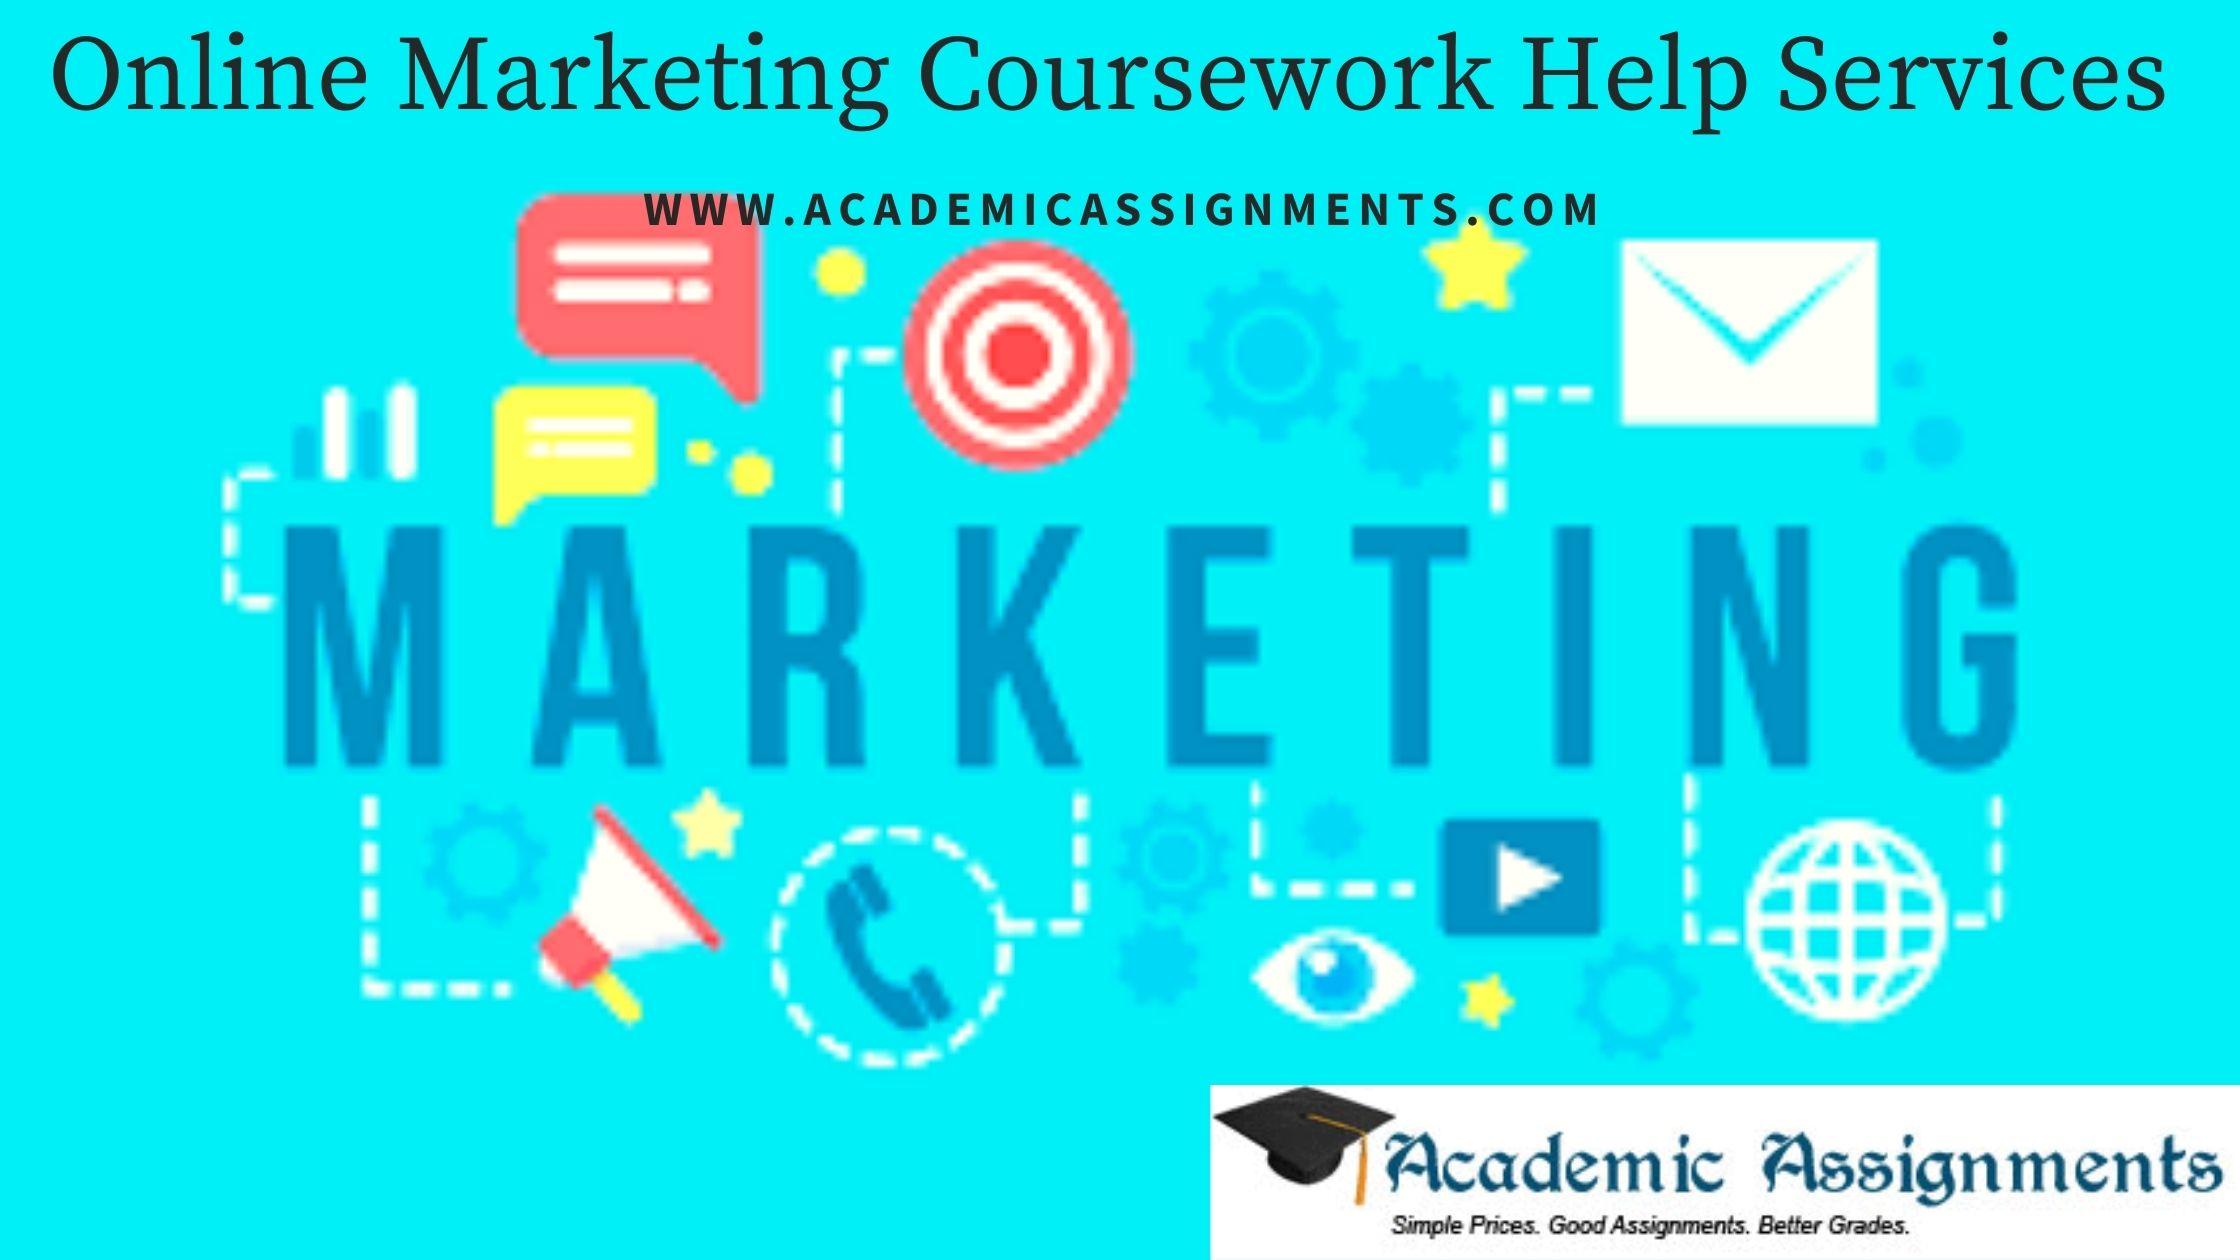 Online Marketing Coursework Help Services